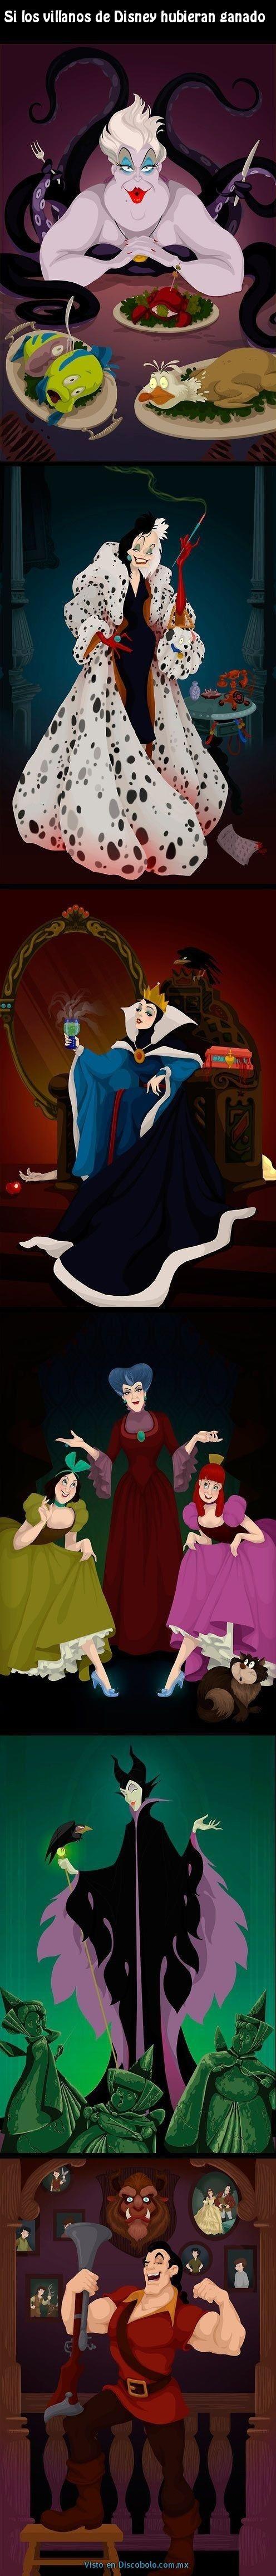 32 Ideas De Walt Disney Terror Princesas Disney Disney Disney Oscuro